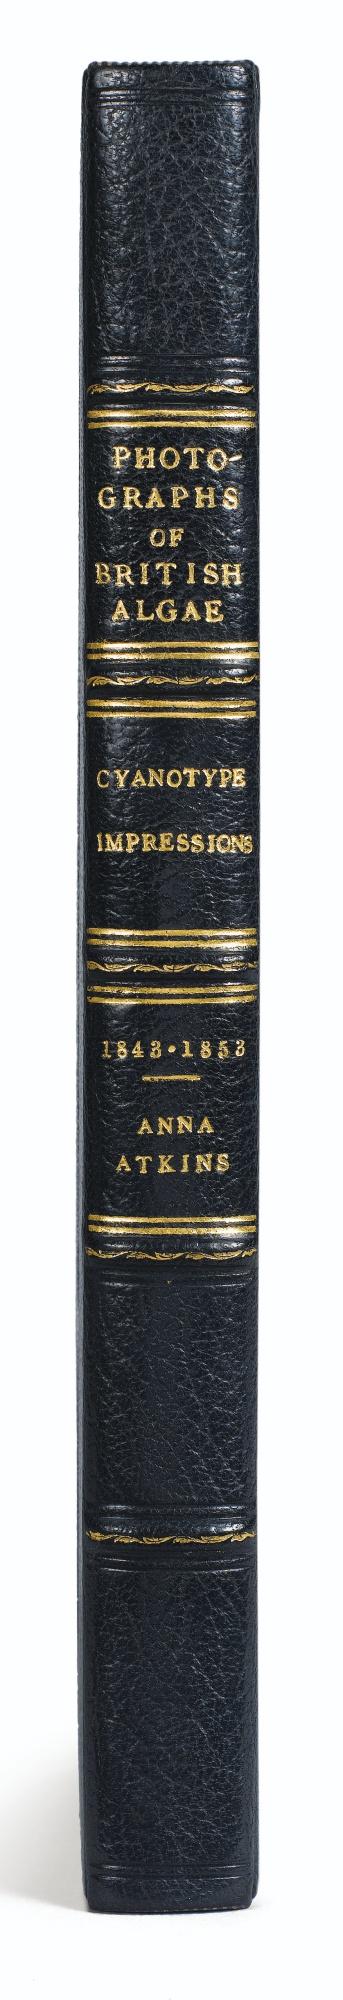 Anna Atkins-British Algae Vol. III-1853